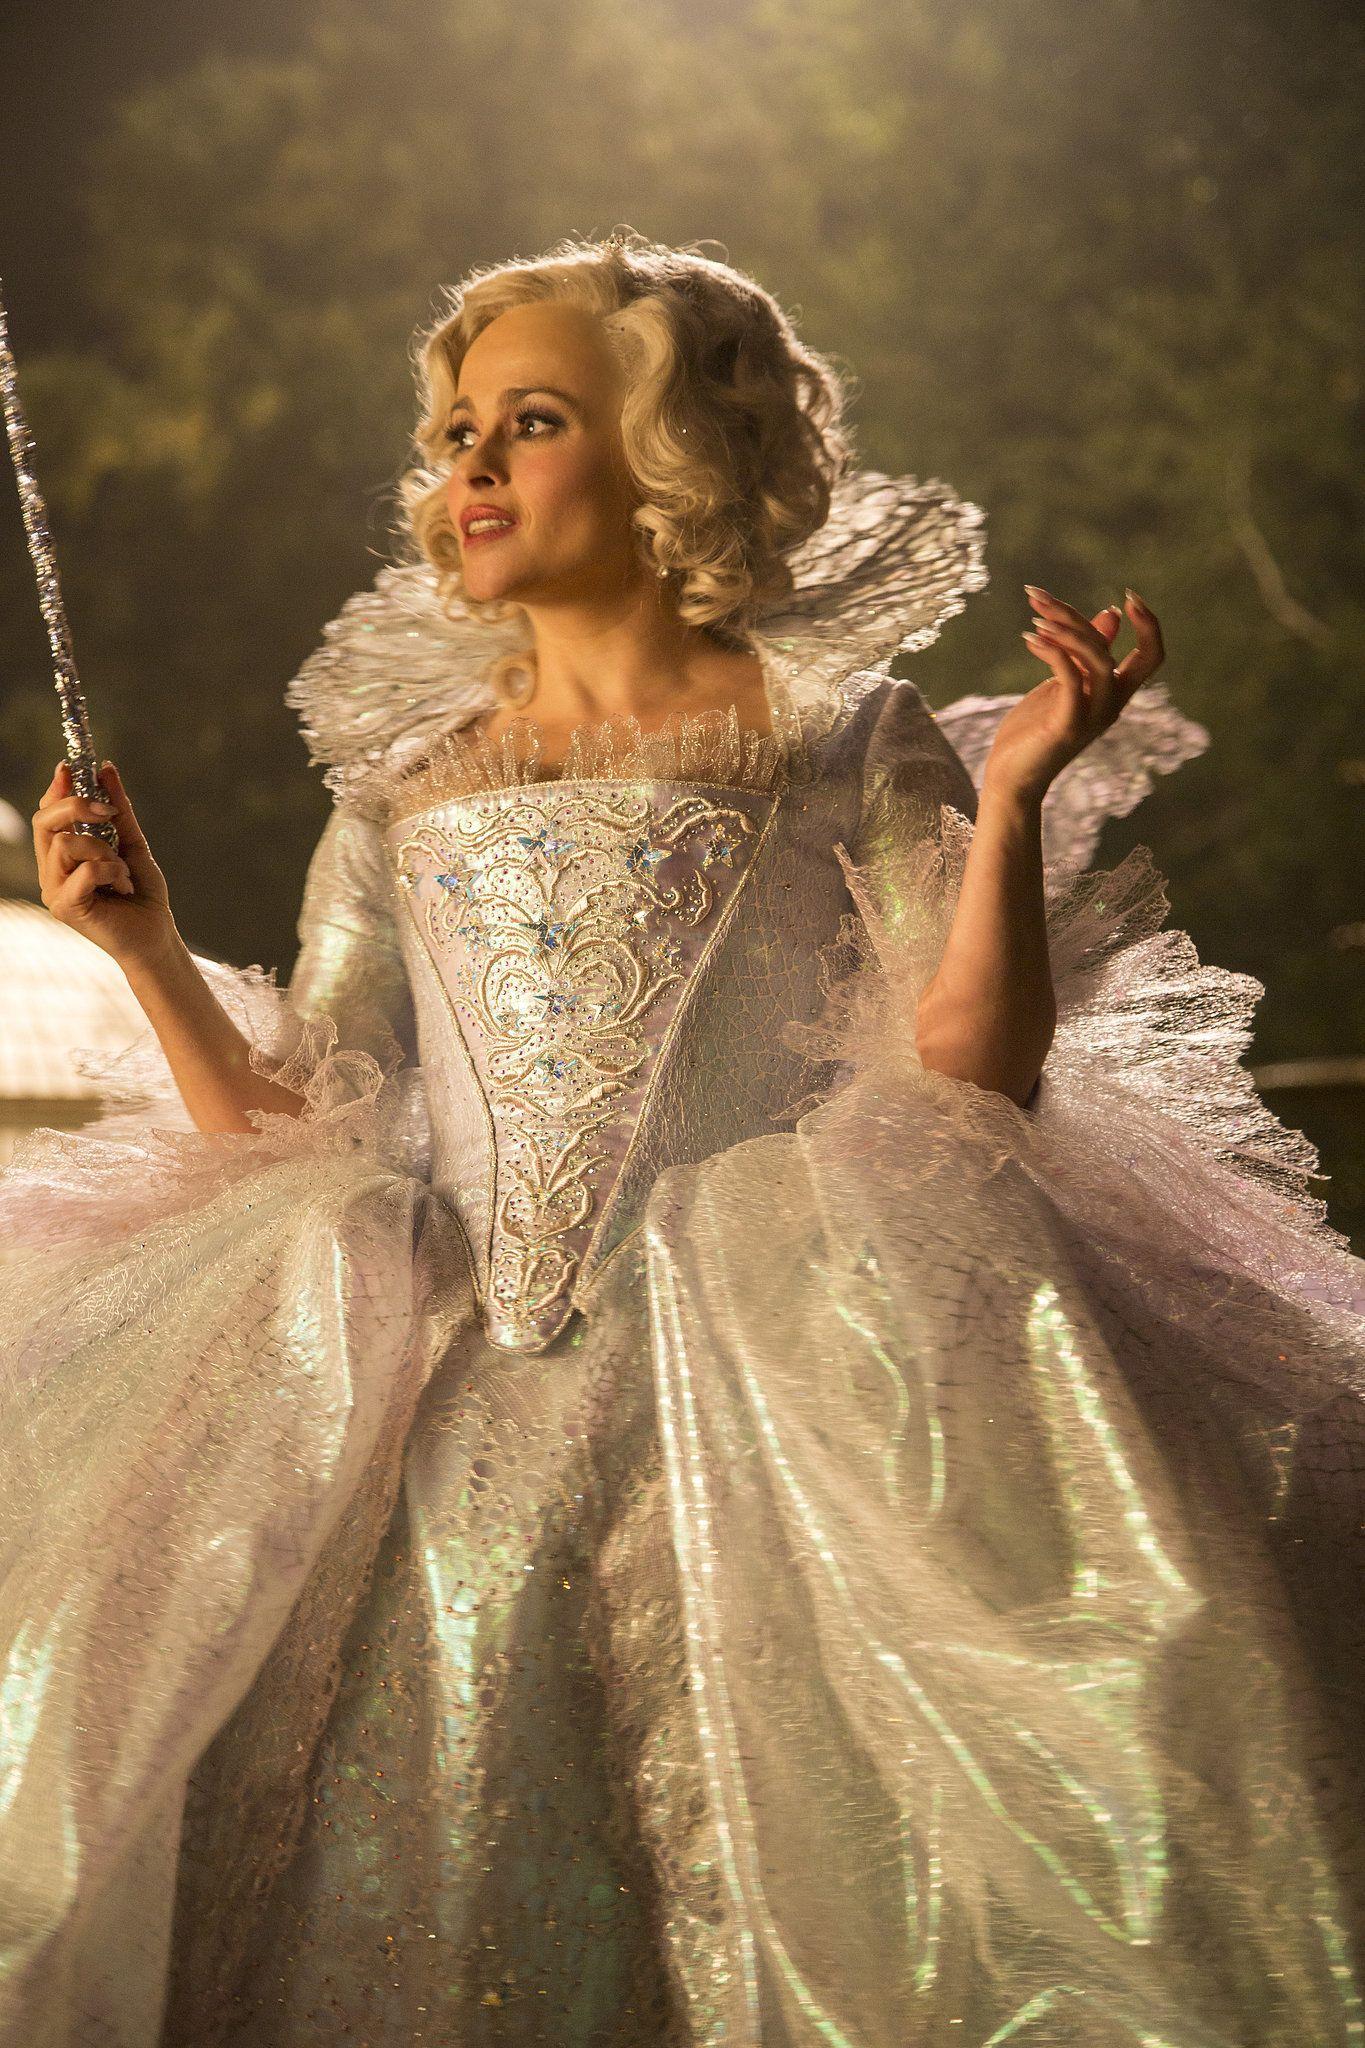 Cinderella S Dazzling Pictures Will Take Your Breath Away Cinderella Movie Cinderella Fairy Godmother Cinderella 2015